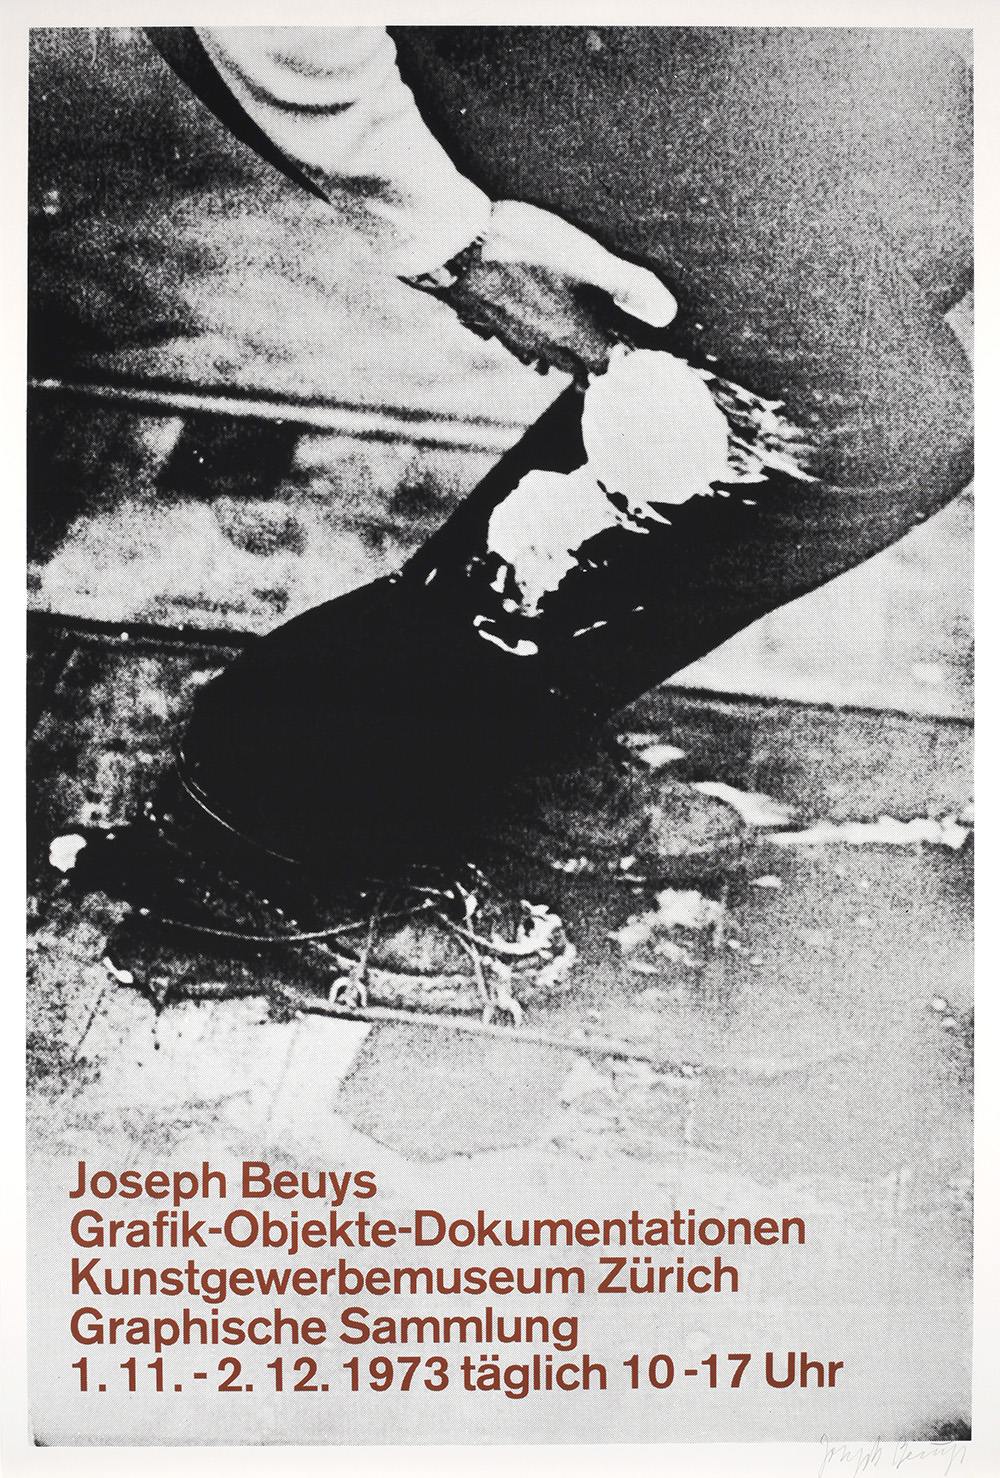 Joseph_Bueys_Graphik_Objekte_Dokumentationen